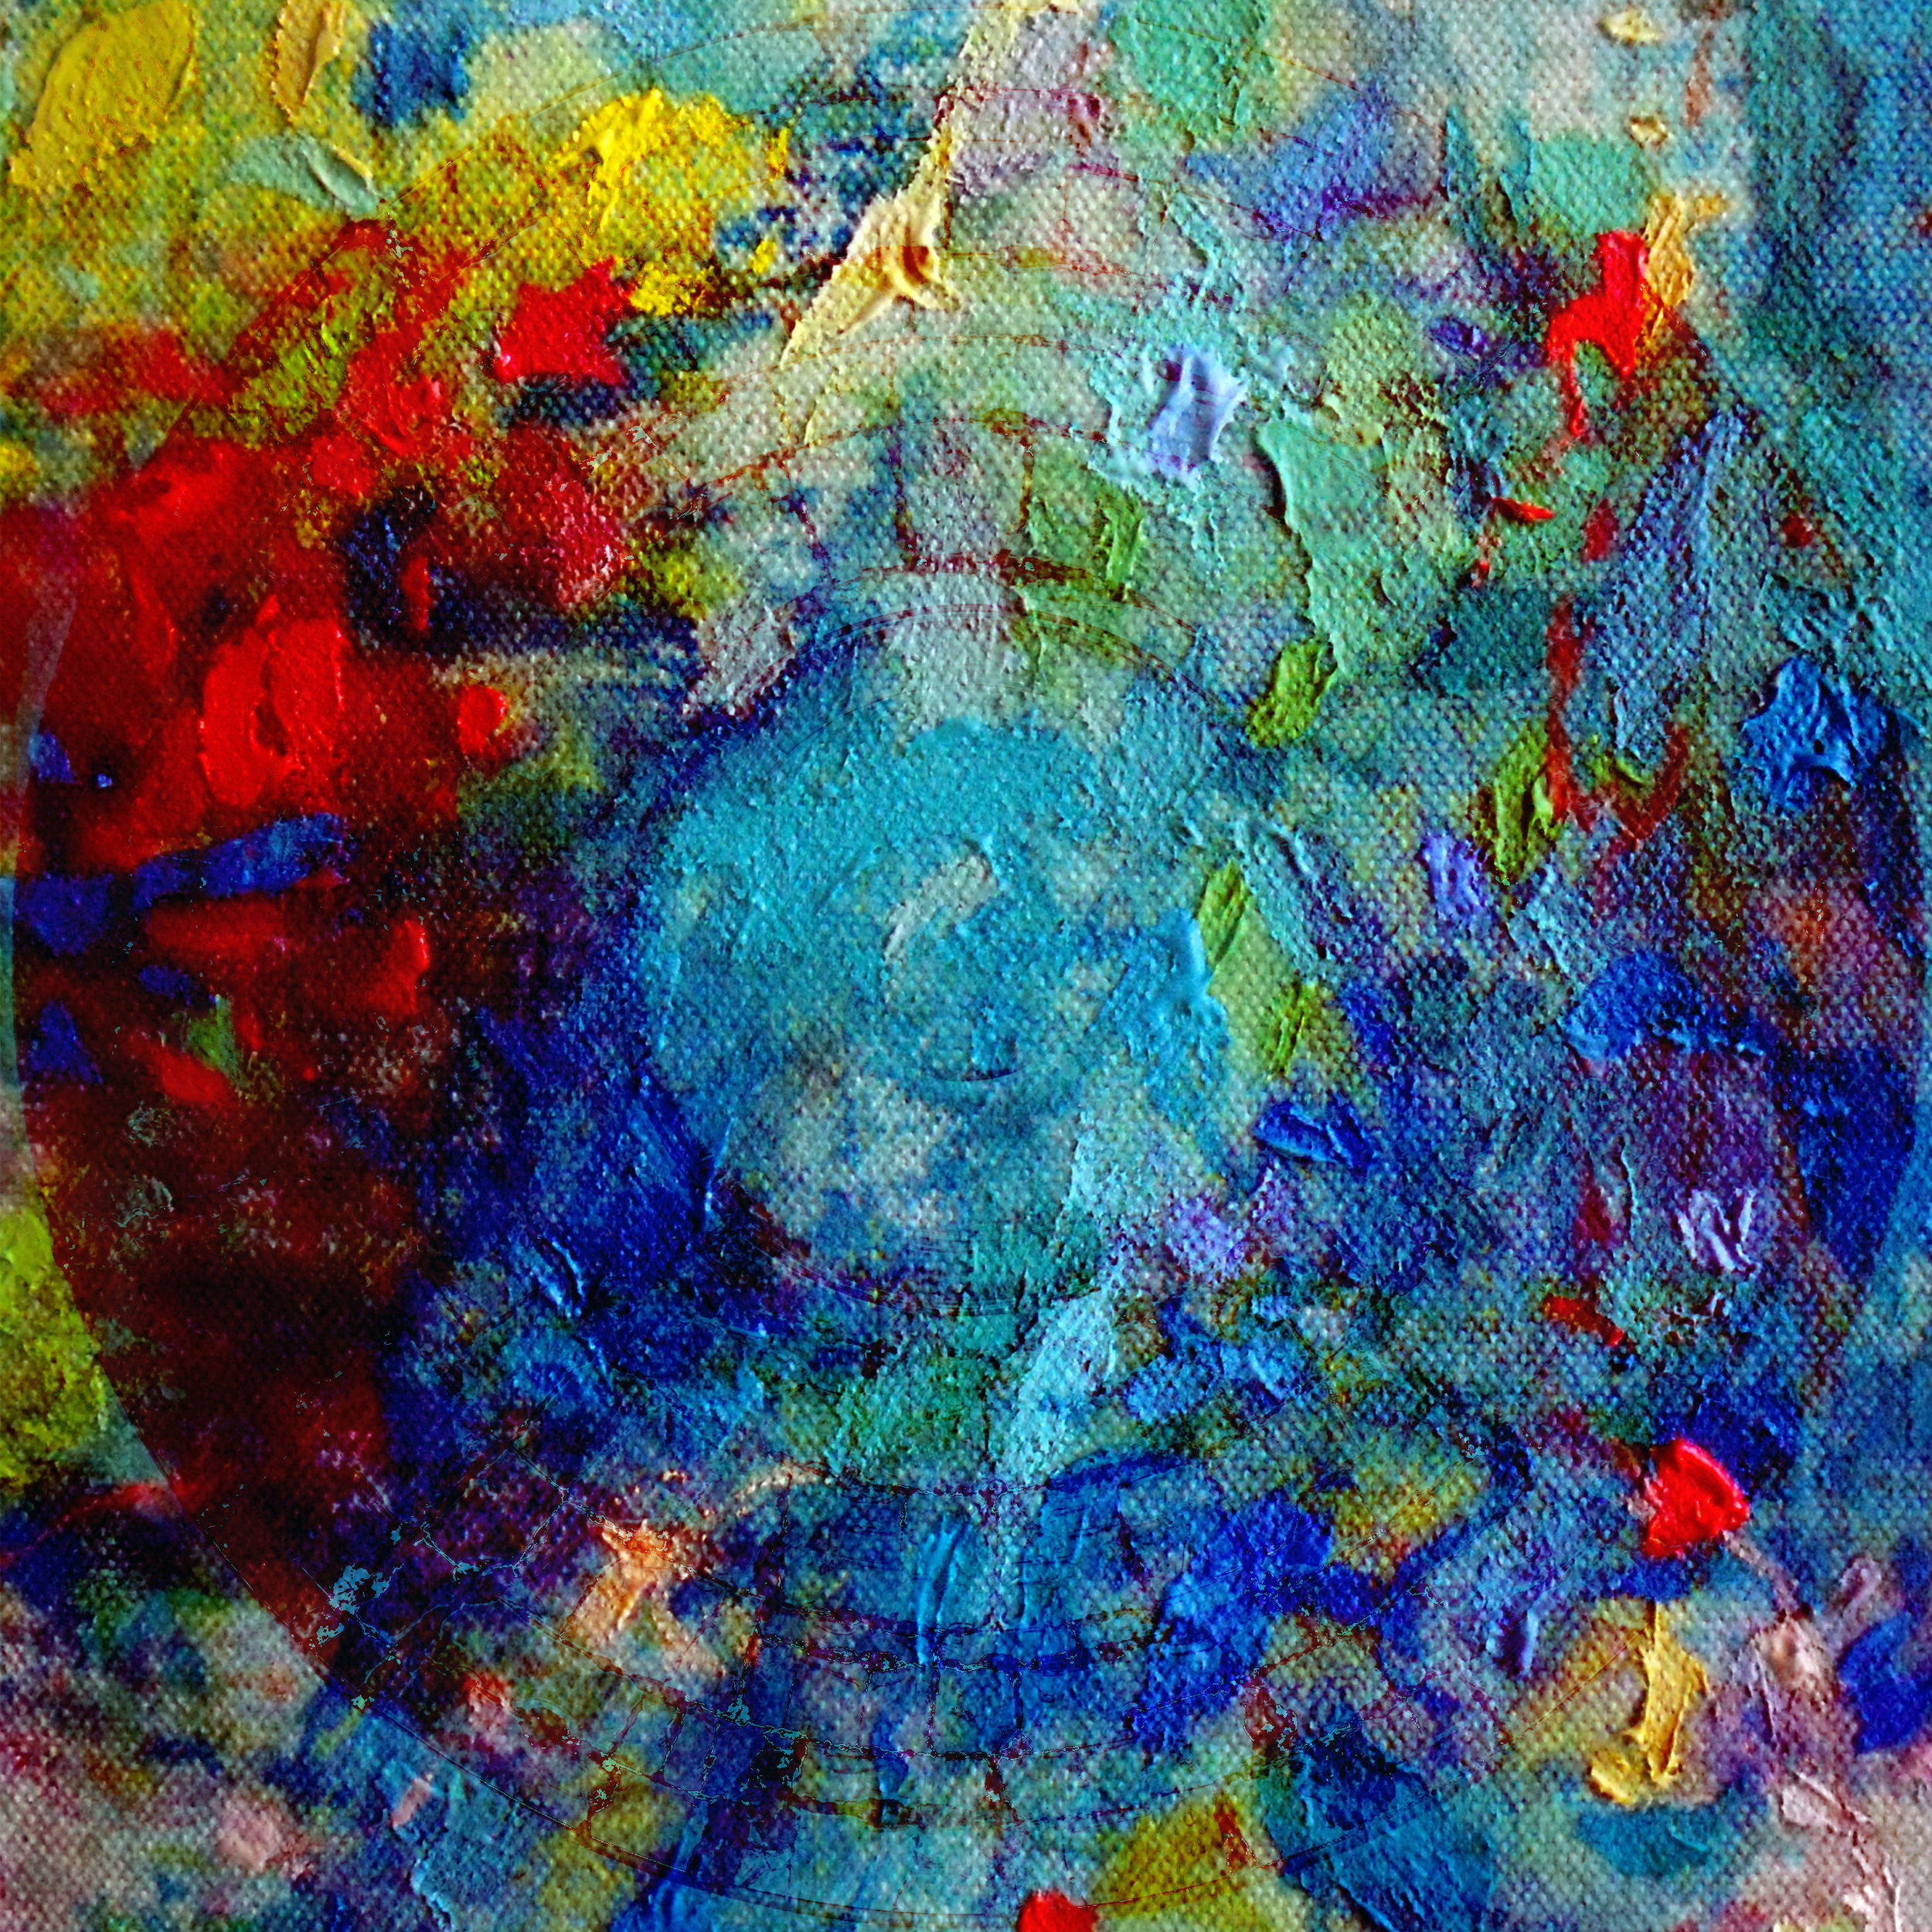 Monet's Water Lilies. Digital. 2019.